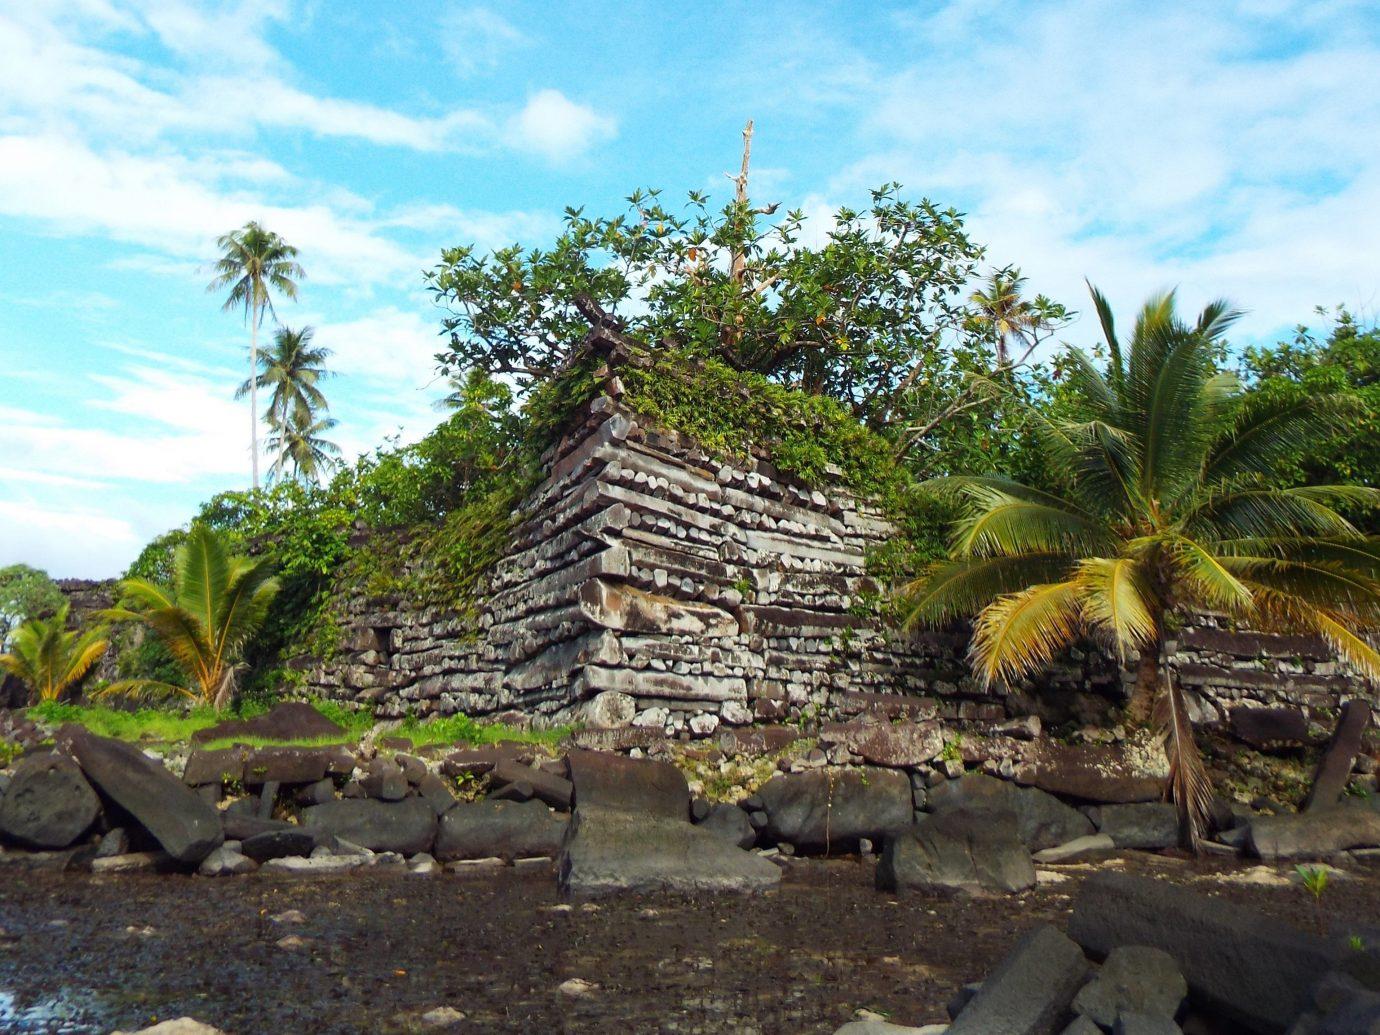 Trip Ideas tree outdoor sky archaeological site rock arecales vacation Ruins Jungle Coast tropics Resort palm family plant hut Village stone shade